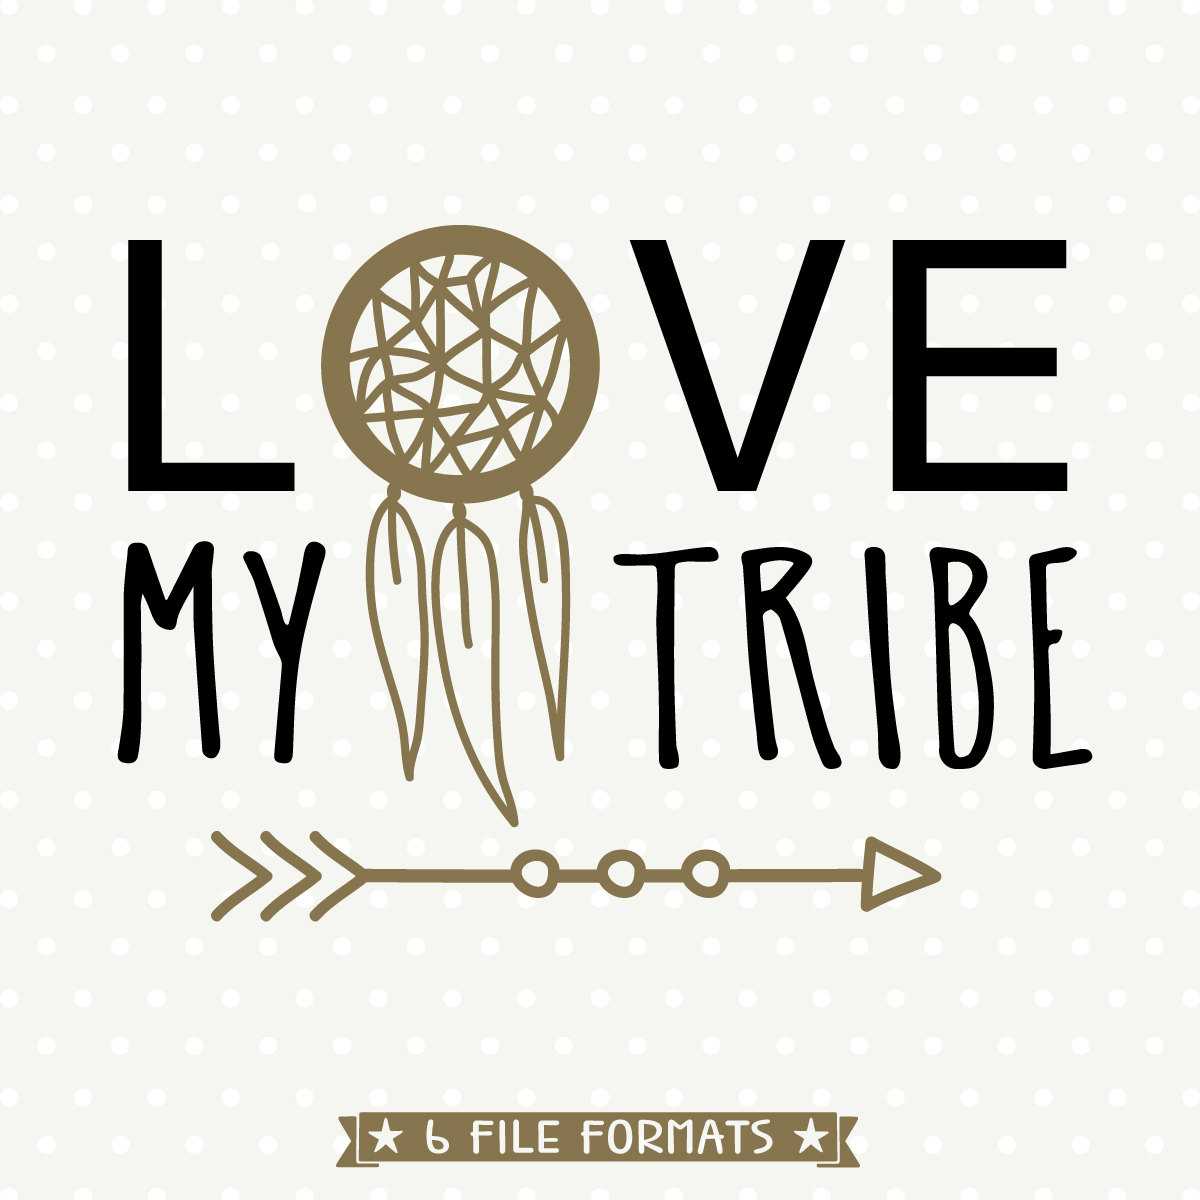 Tribal svg #191, Download drawings